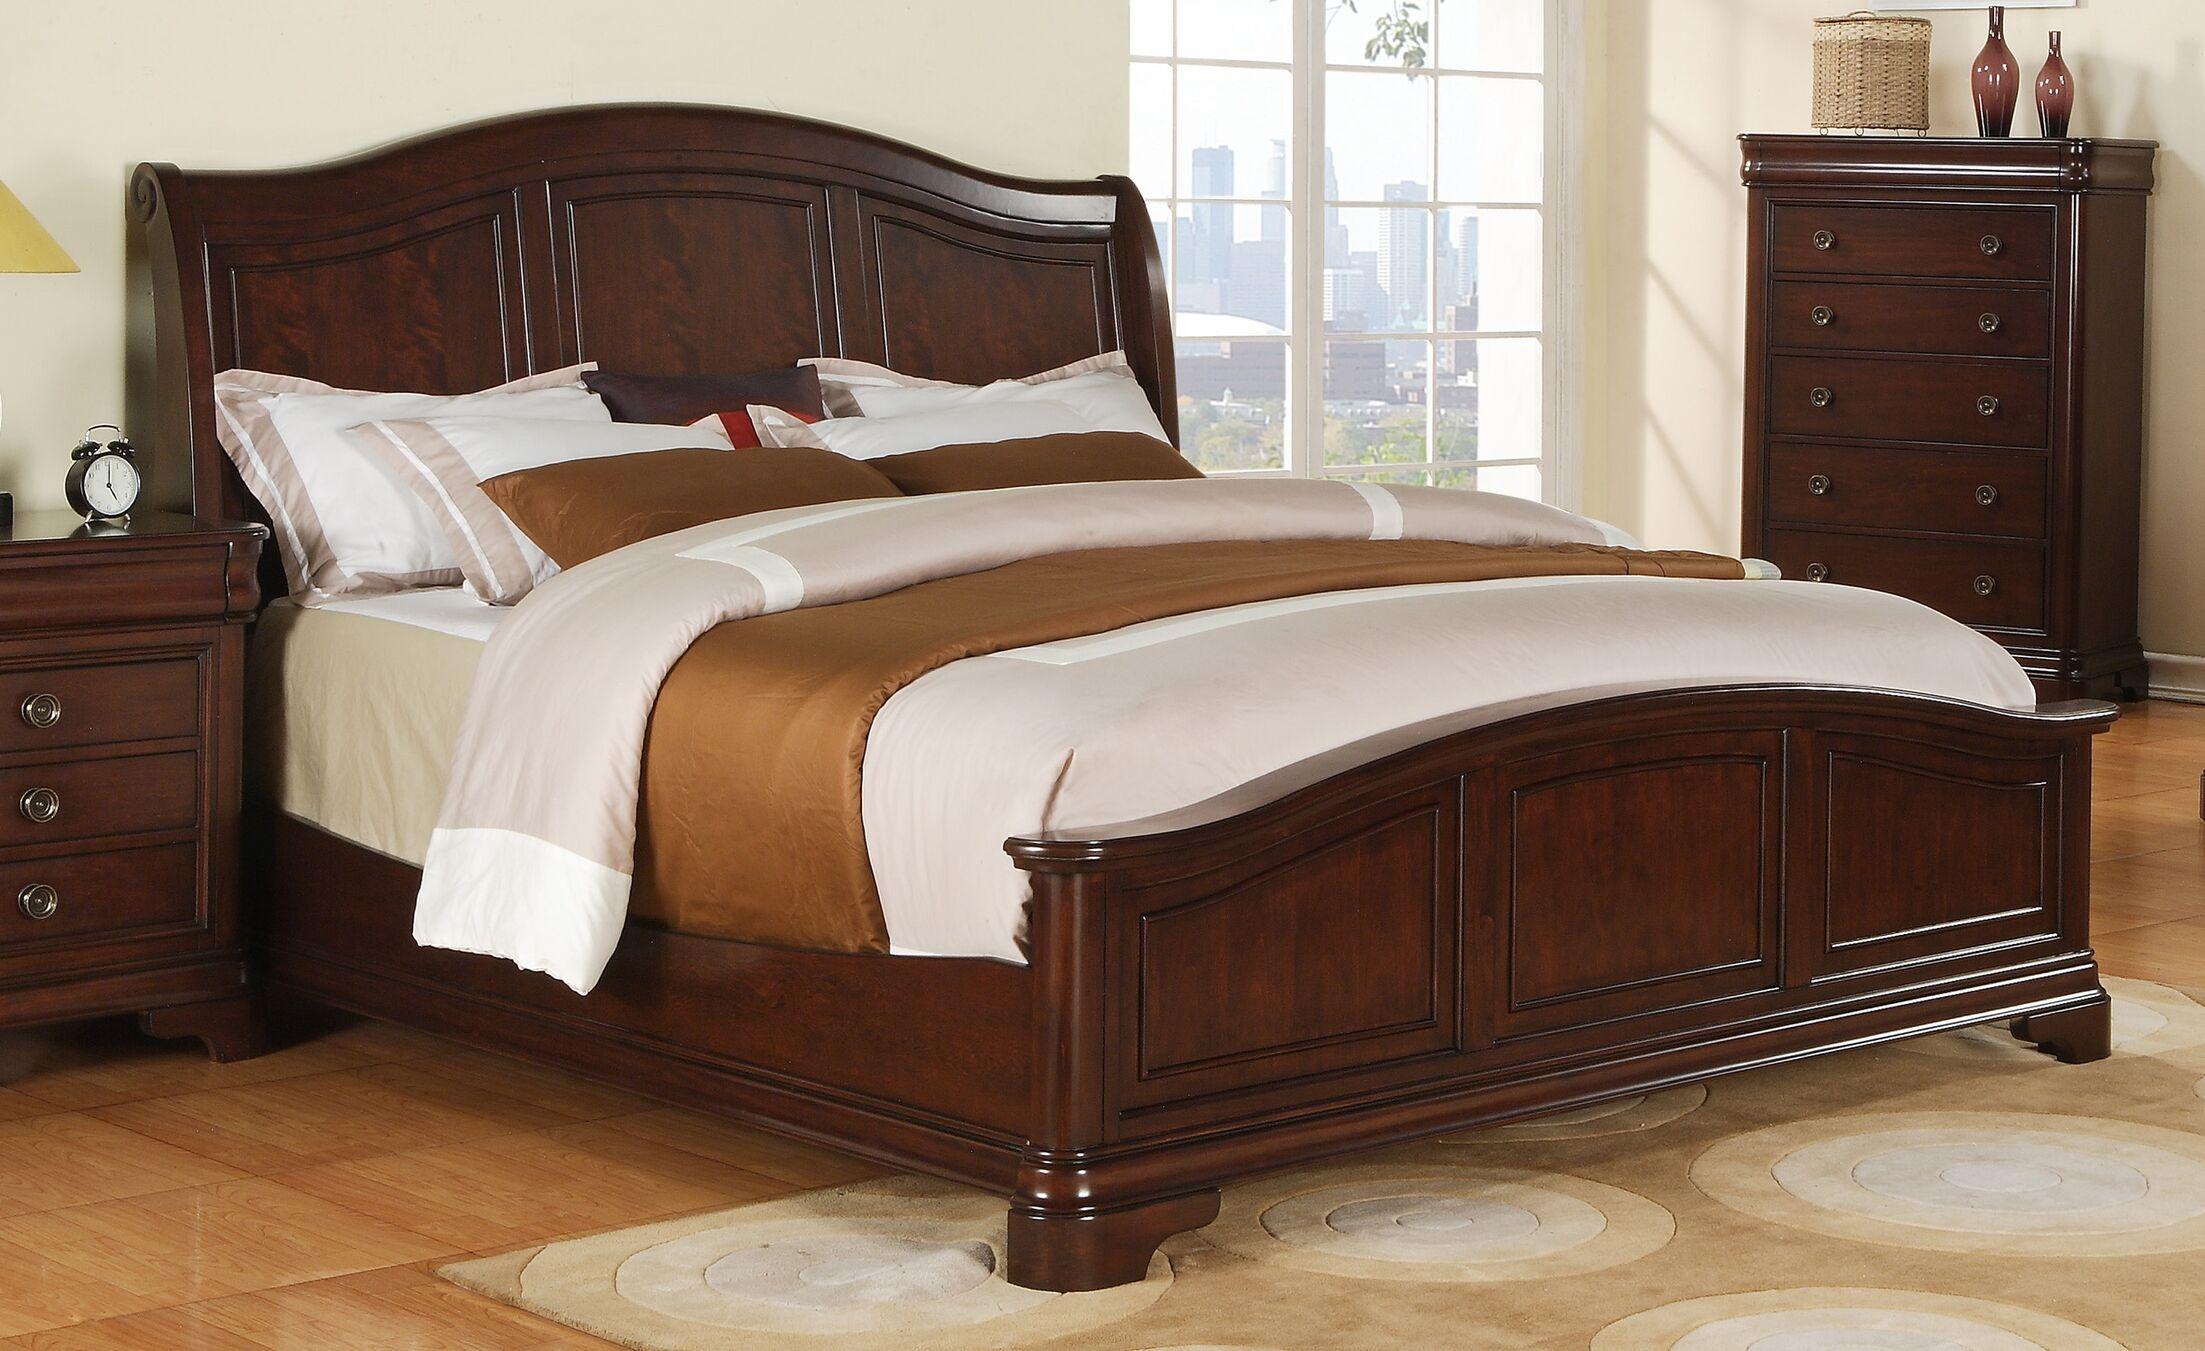 Mcnabb Panel Bed Size: King